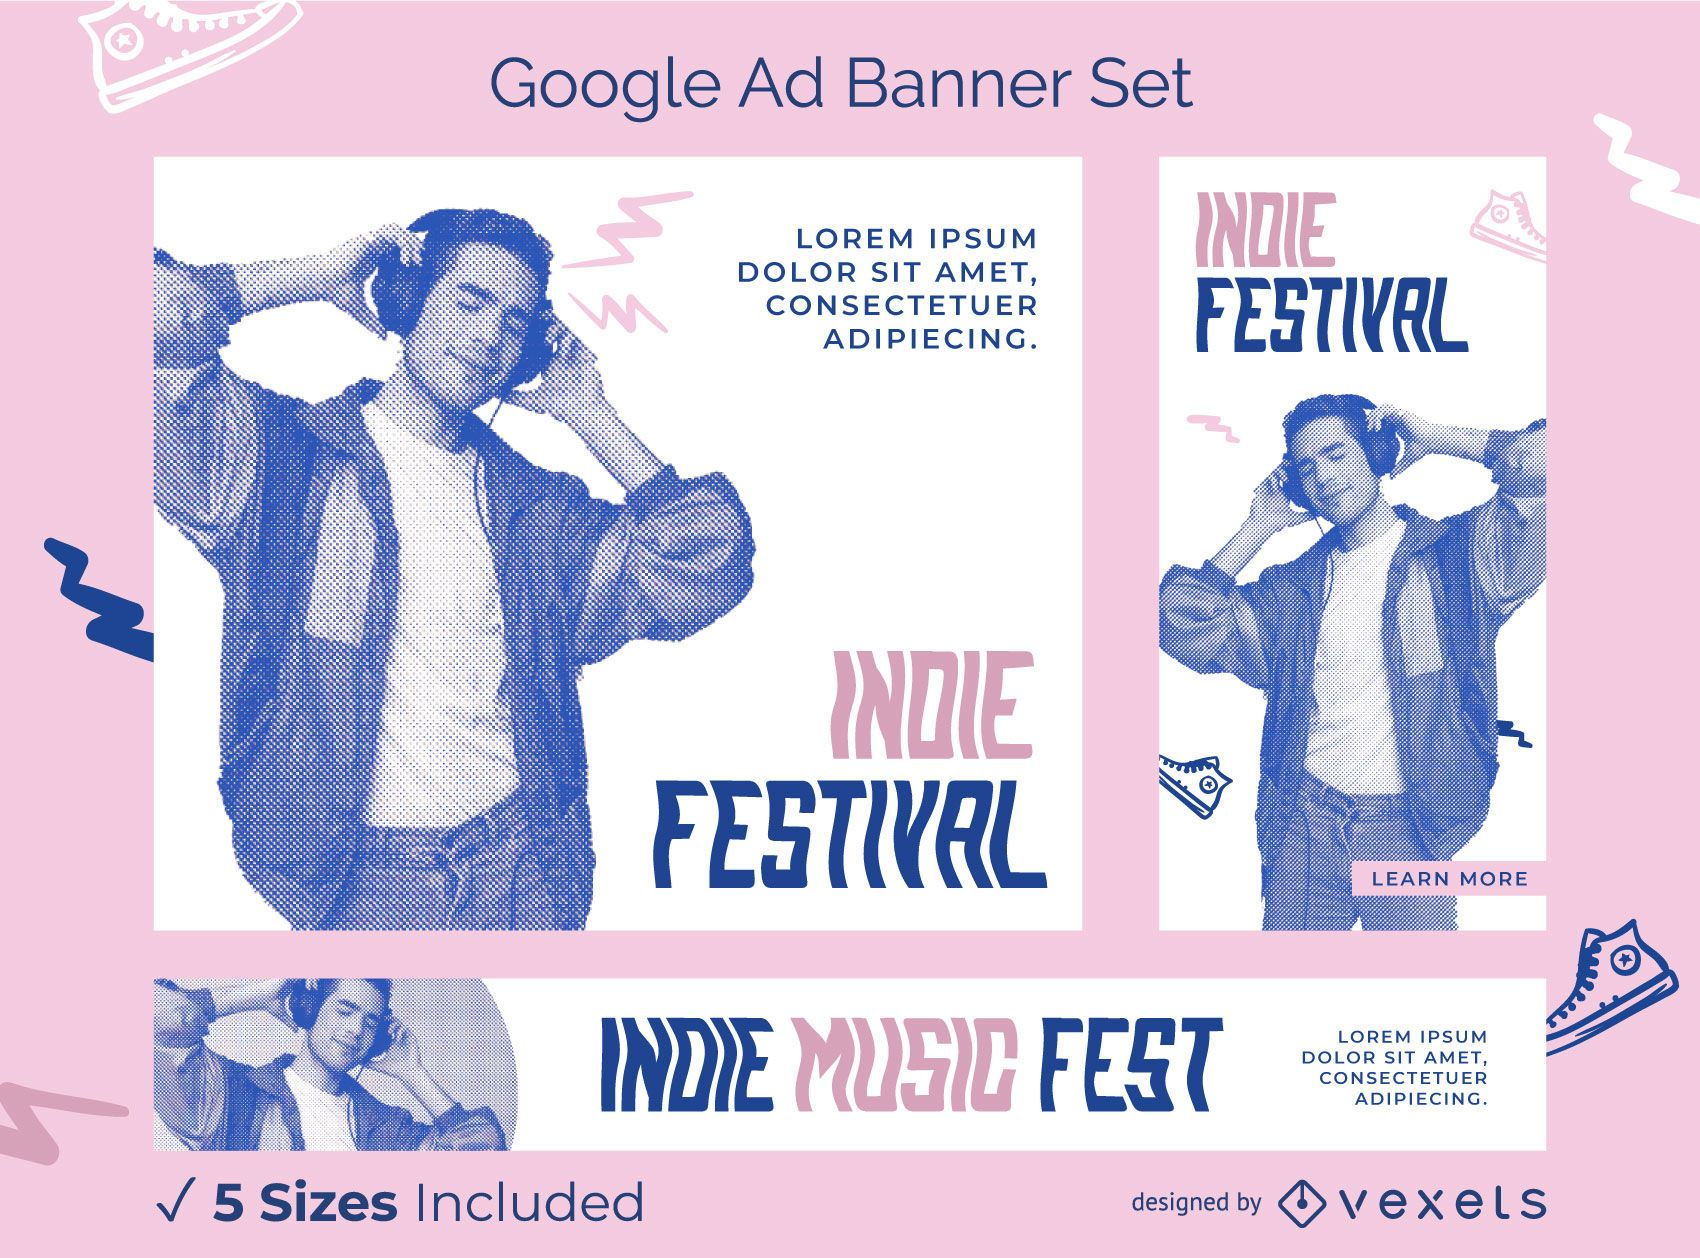 Indie Festival Google Ads Banner Pack